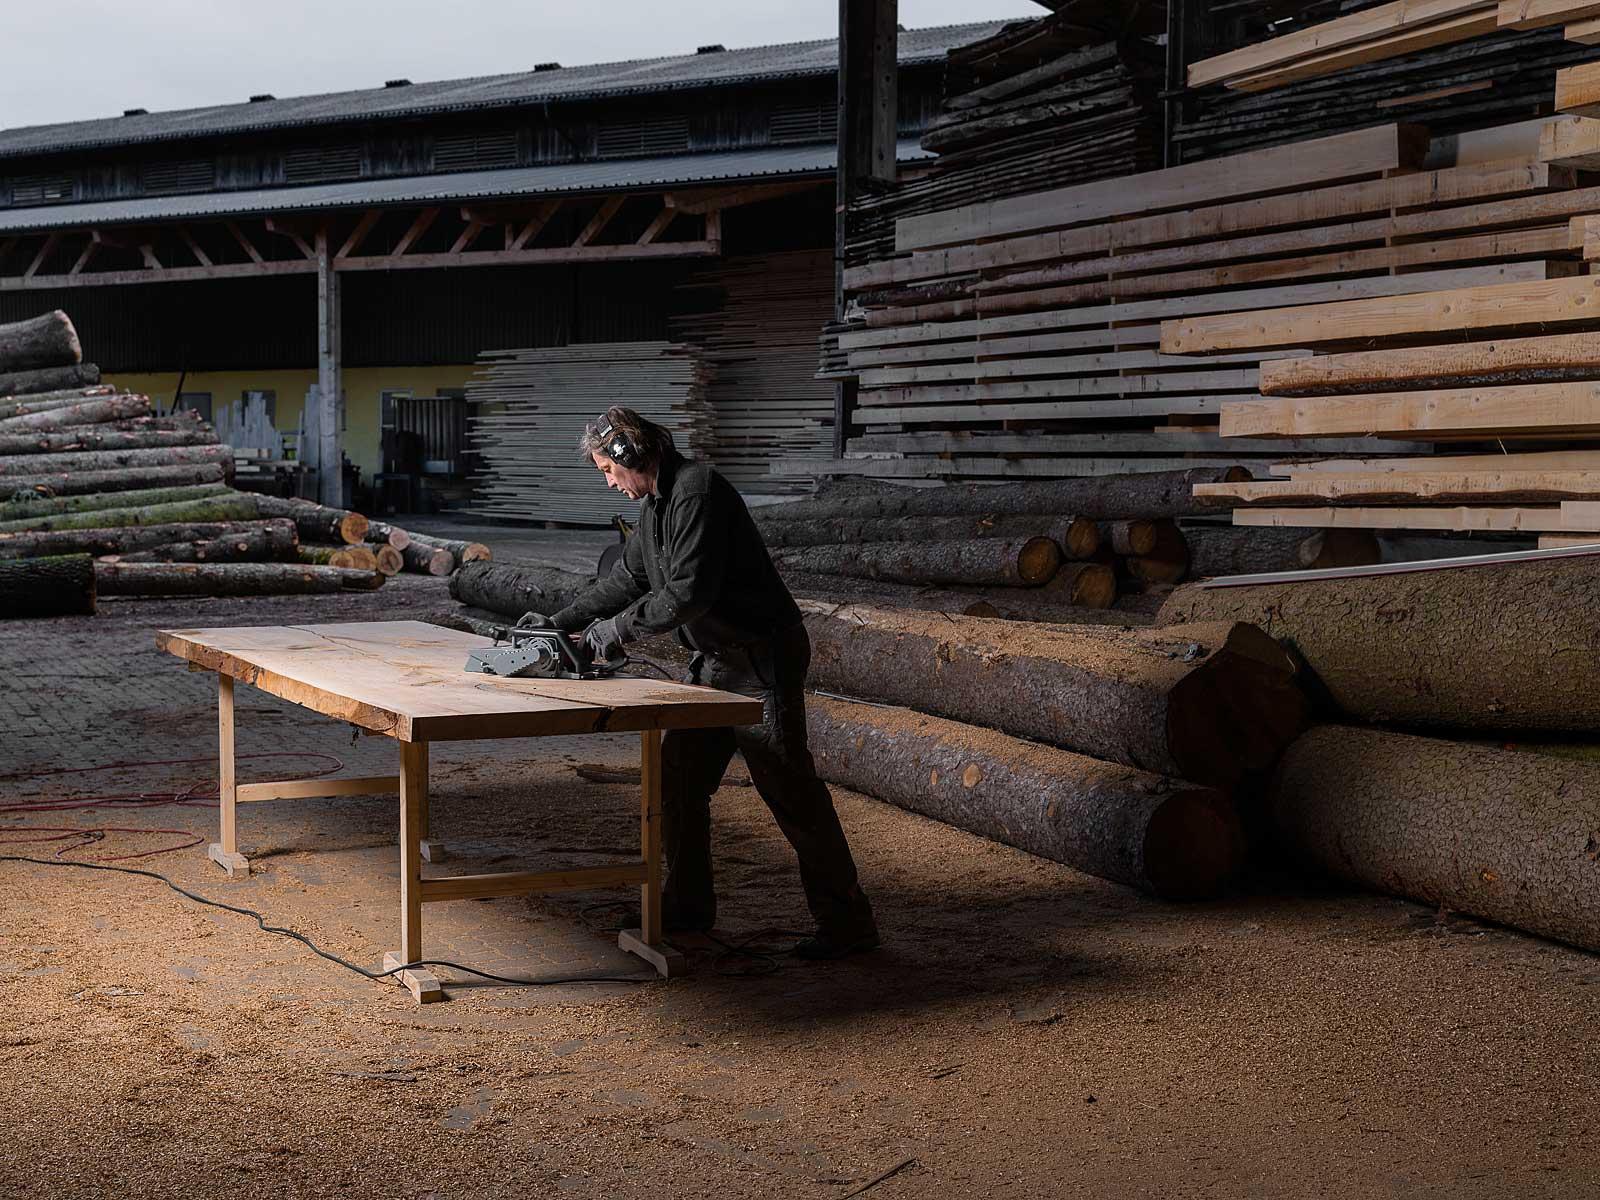 Stefan Knopp fertigt Einzelstücke, Monolith Tisch